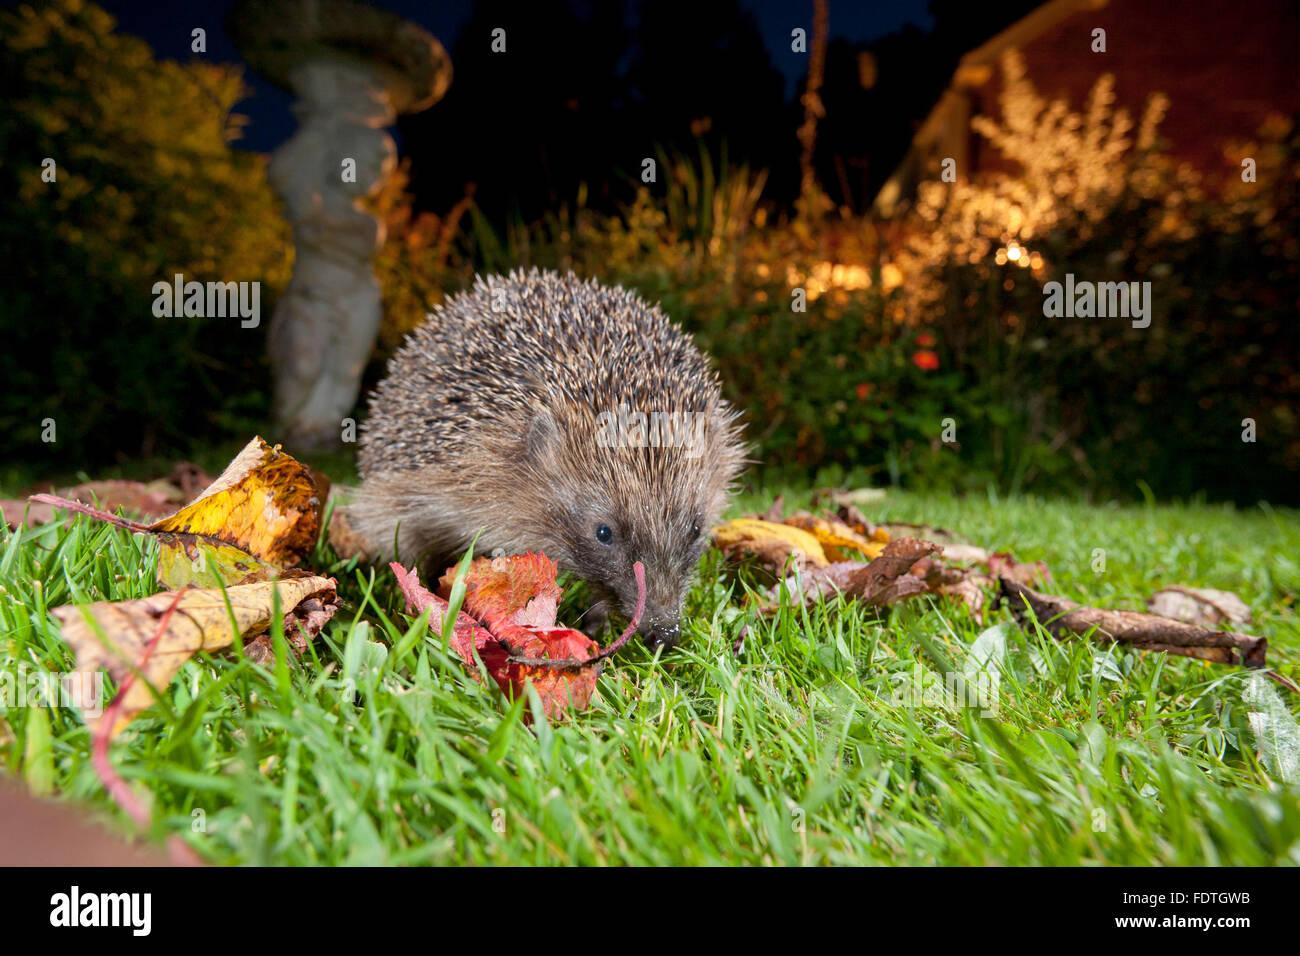 European Hedgehog (Erinaceus europaeus) wild adult, feeding on a garden lawn at night. Powys, Wales. September. - Stock Image